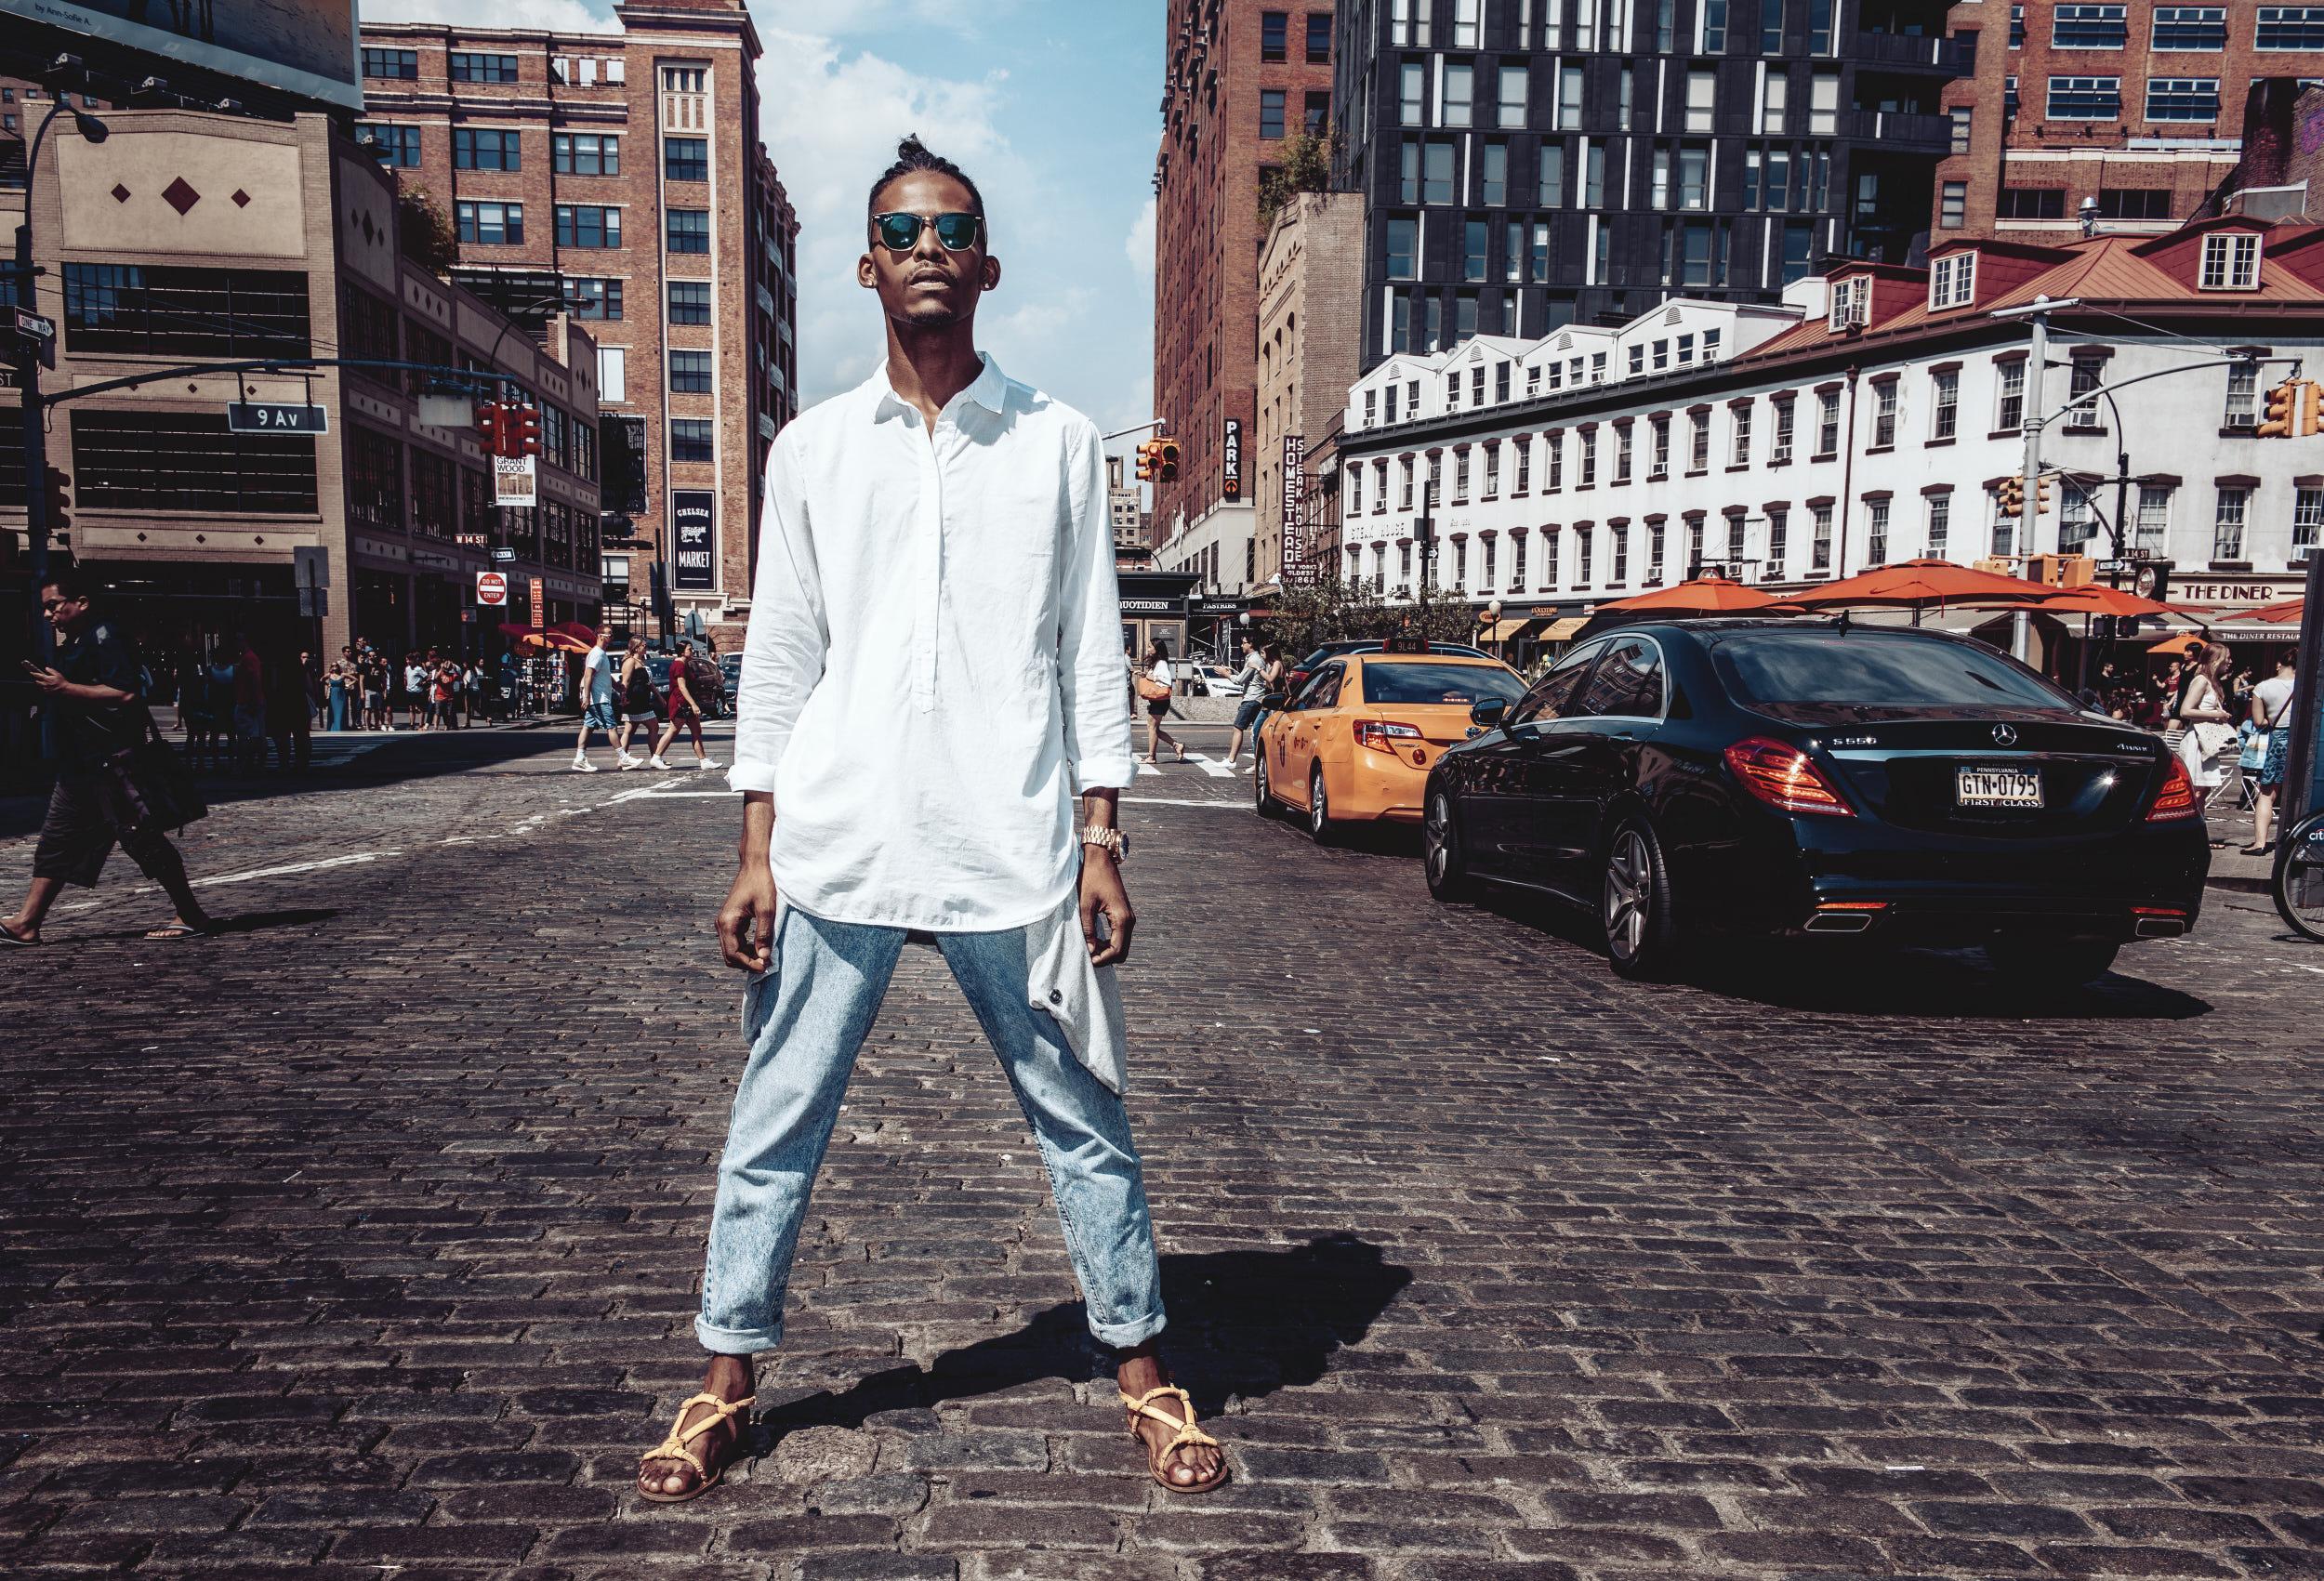 Joe Friend Photography | Fashion Photography | Moving Portraits NYC